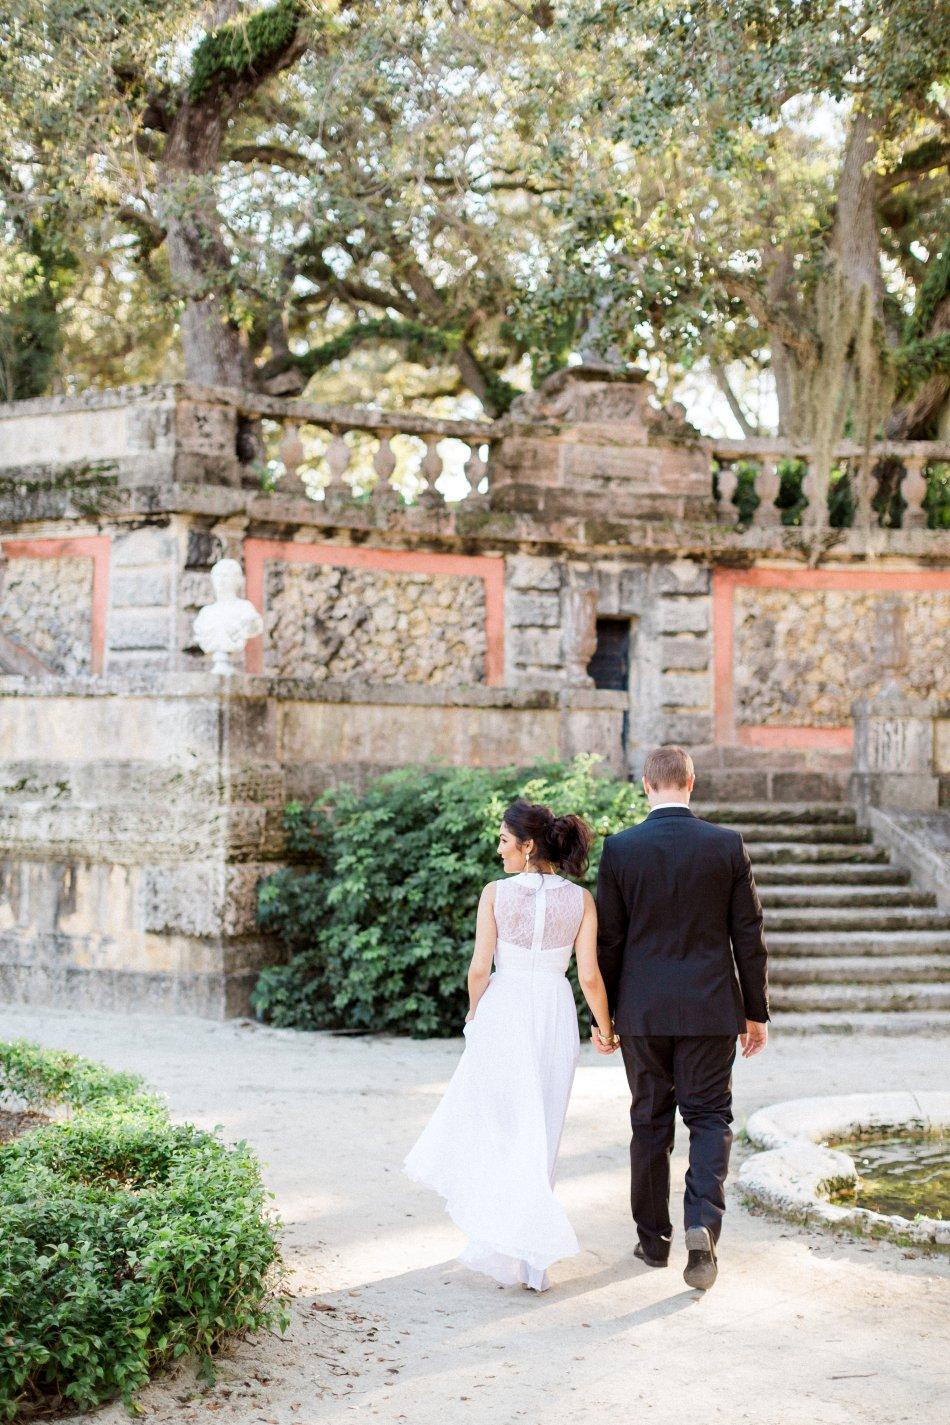 vizcaya-miami-wedding-photographer-florida-luxury-engagement_0376.jpg